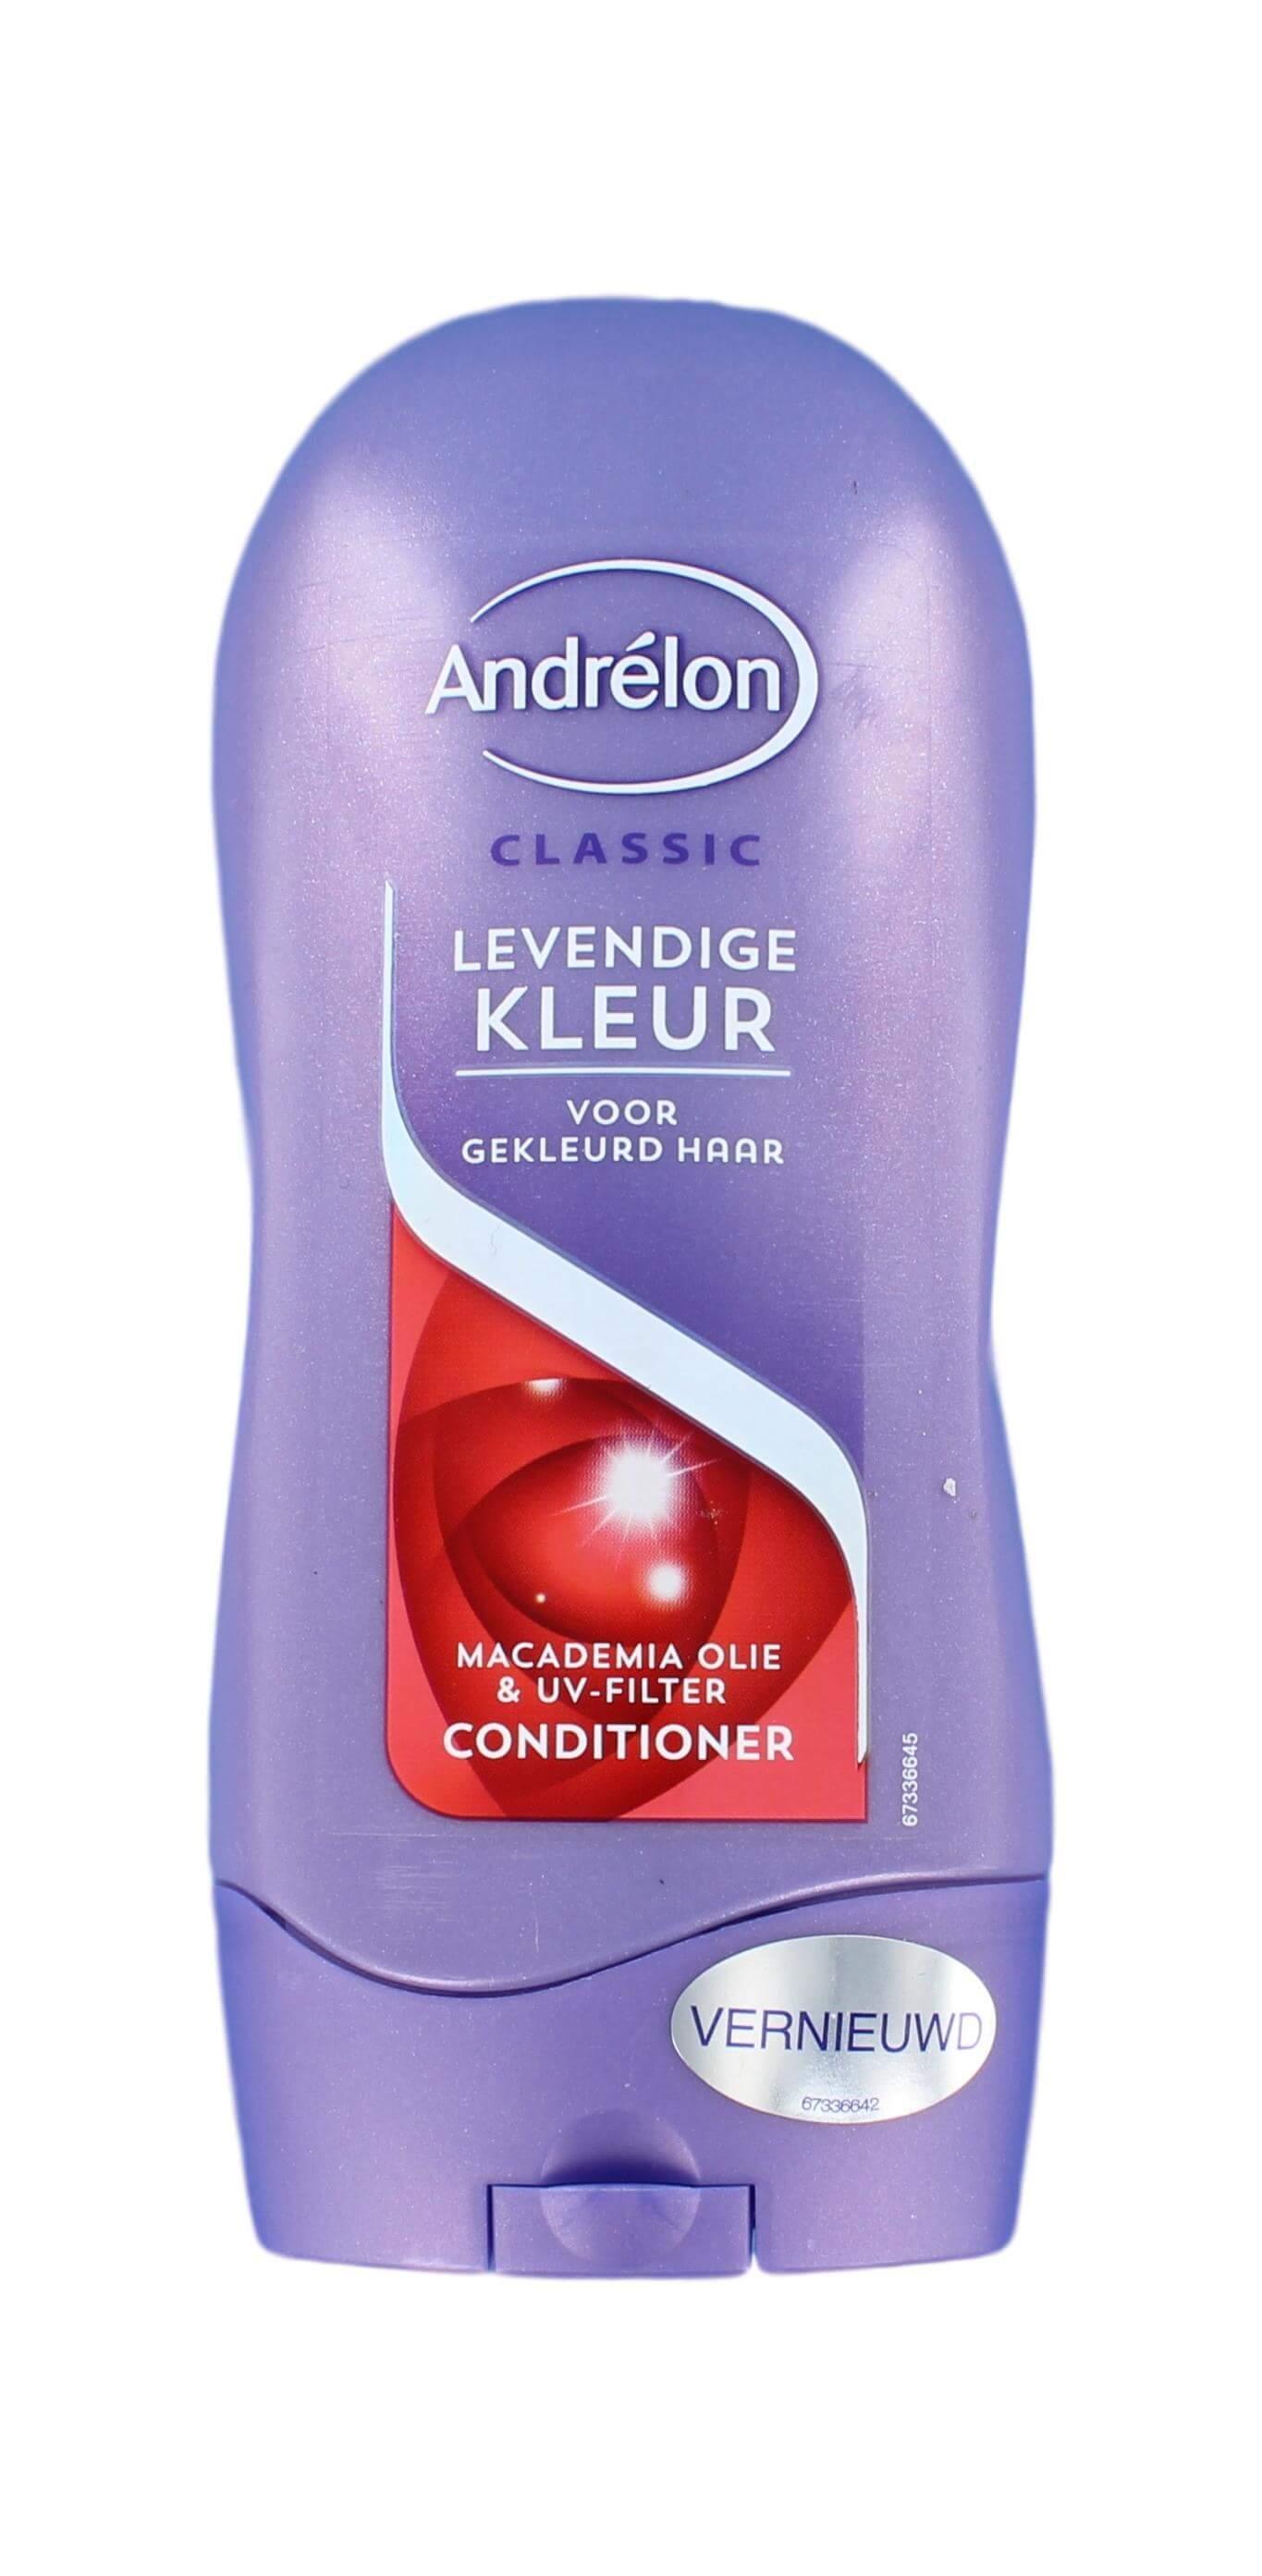 Andrelon Conditioner Levendige Kleur, 300 ml